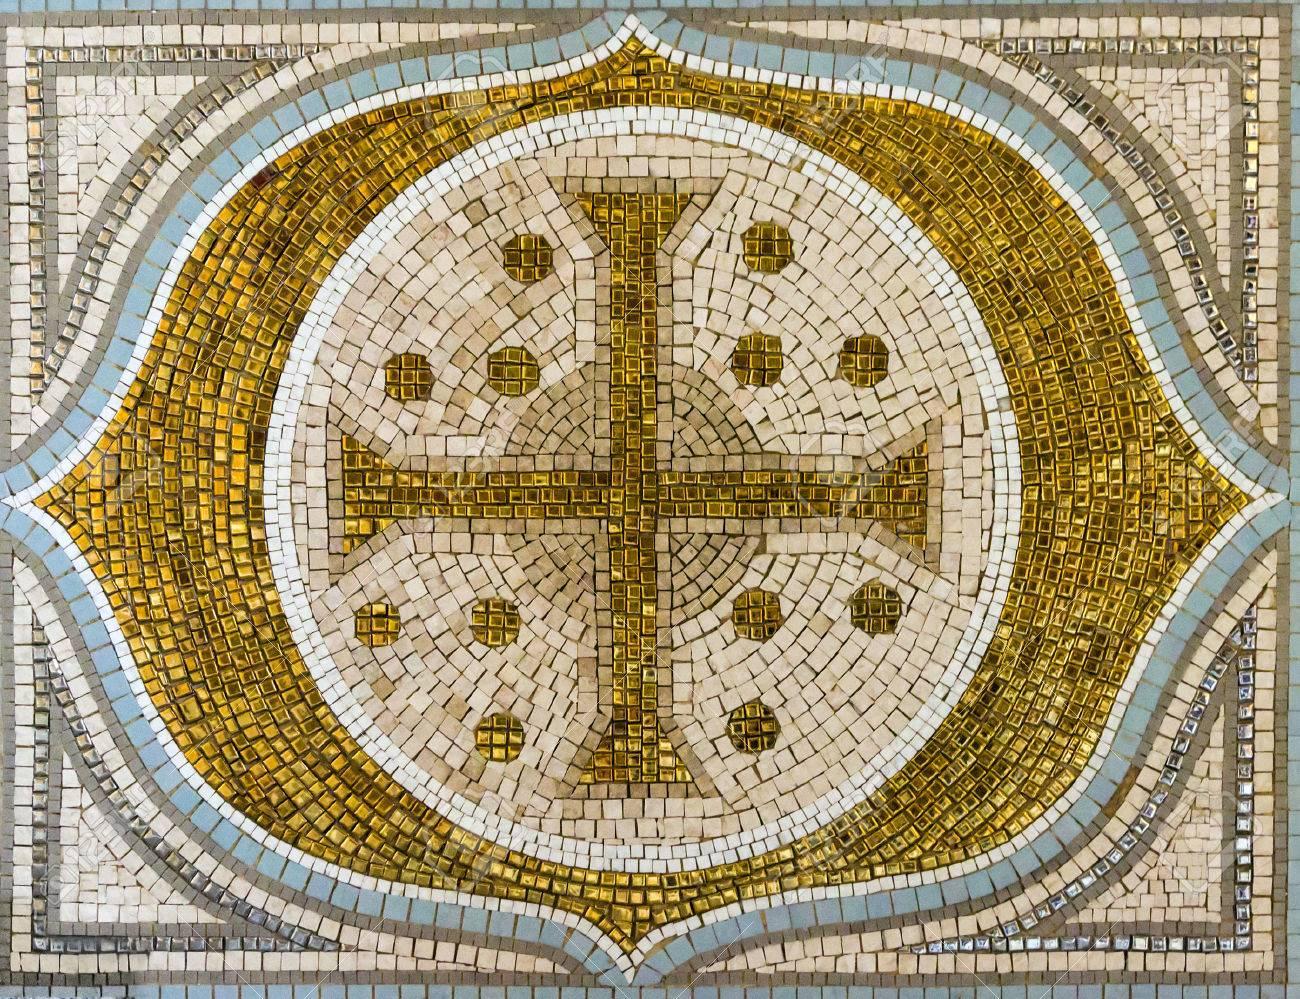 Mosaic Tile Gold Cross Christianity Religious Decor Stock Photo ...